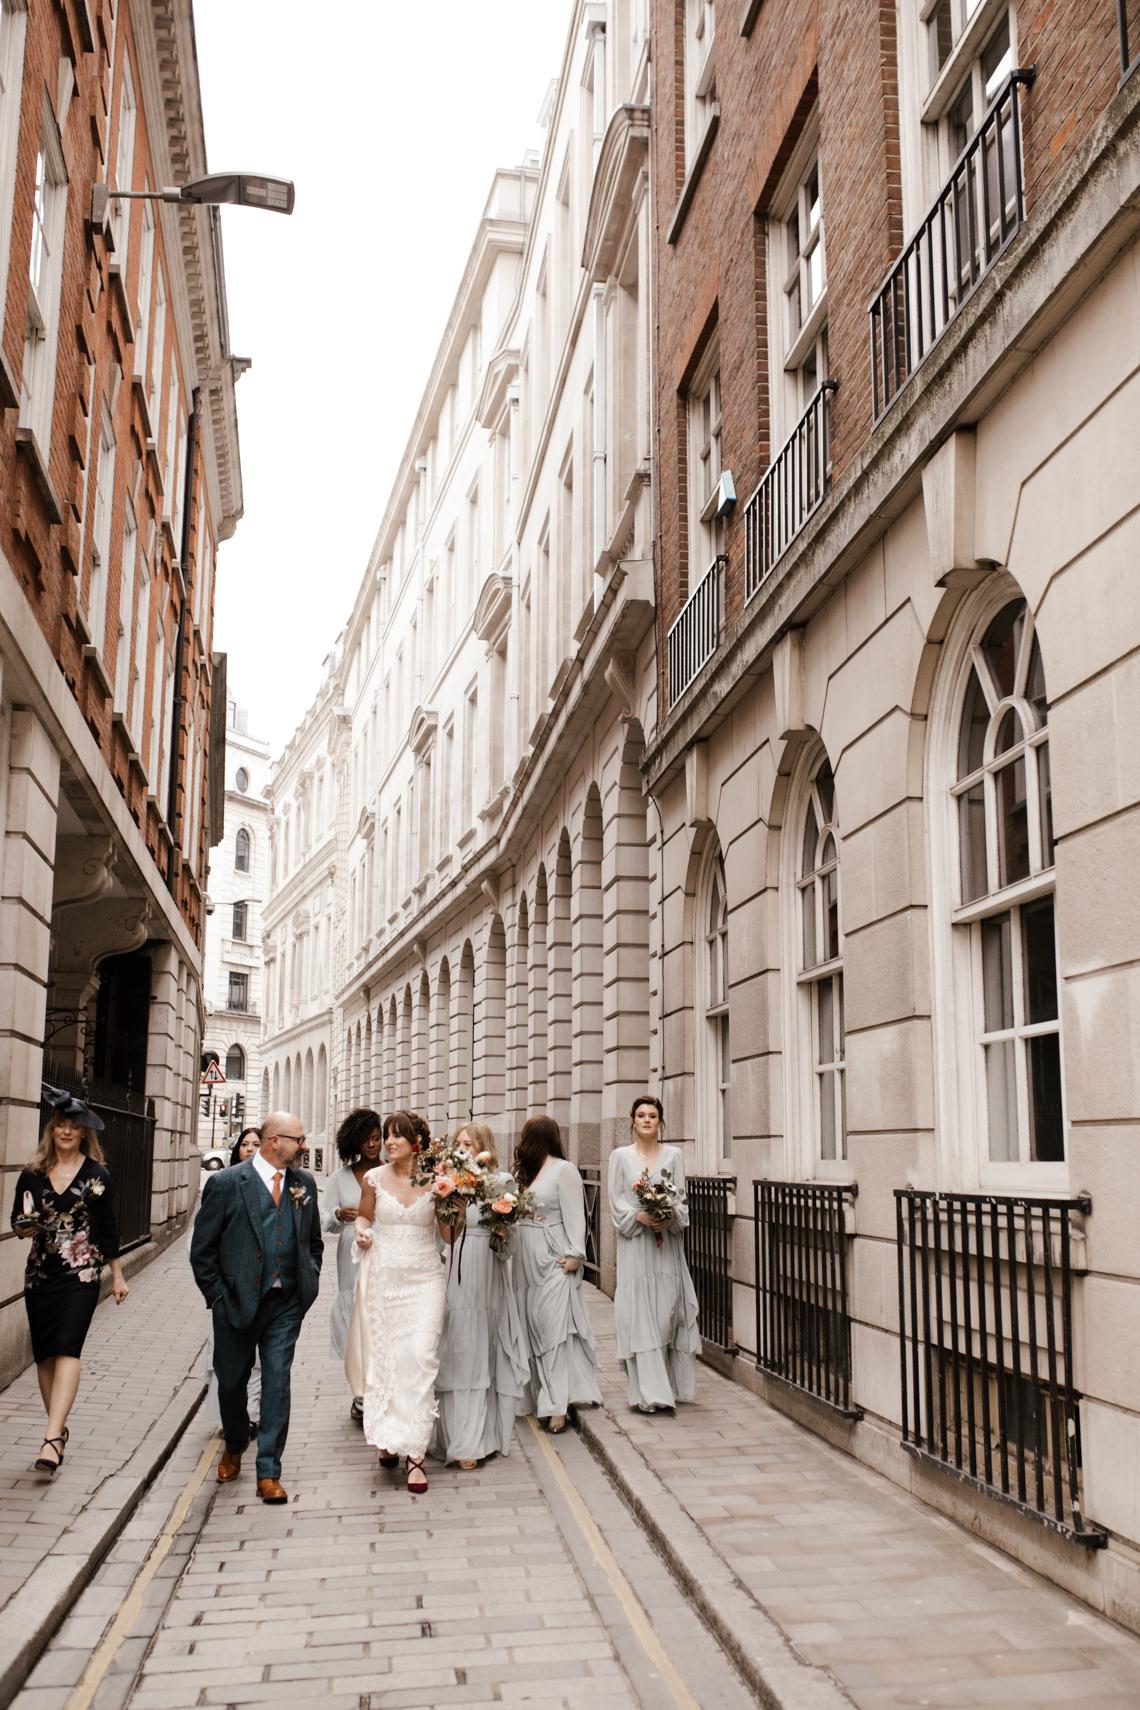 Swanky London Bank Wedding – Jessica Williams 23